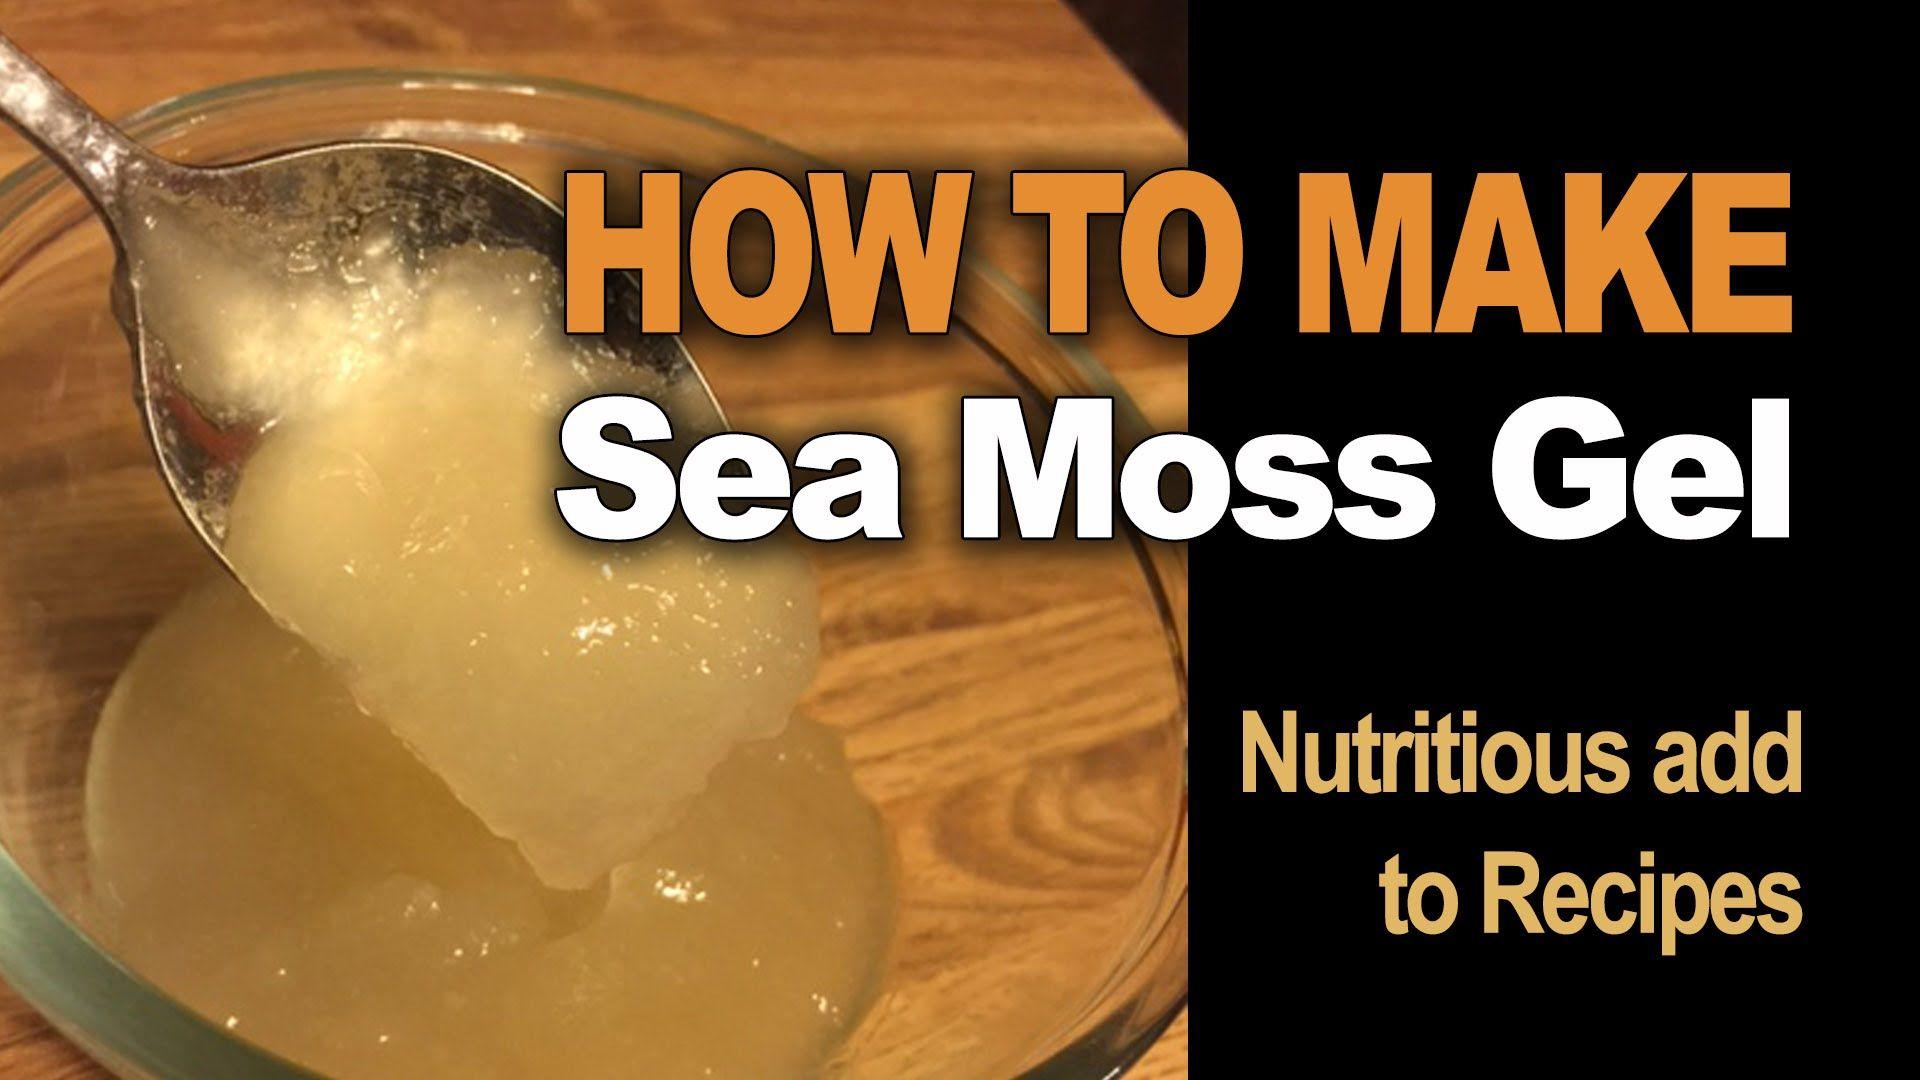 How to make Sea Moss Gel  Sea moss, Dr sebi alkaline food, Gel